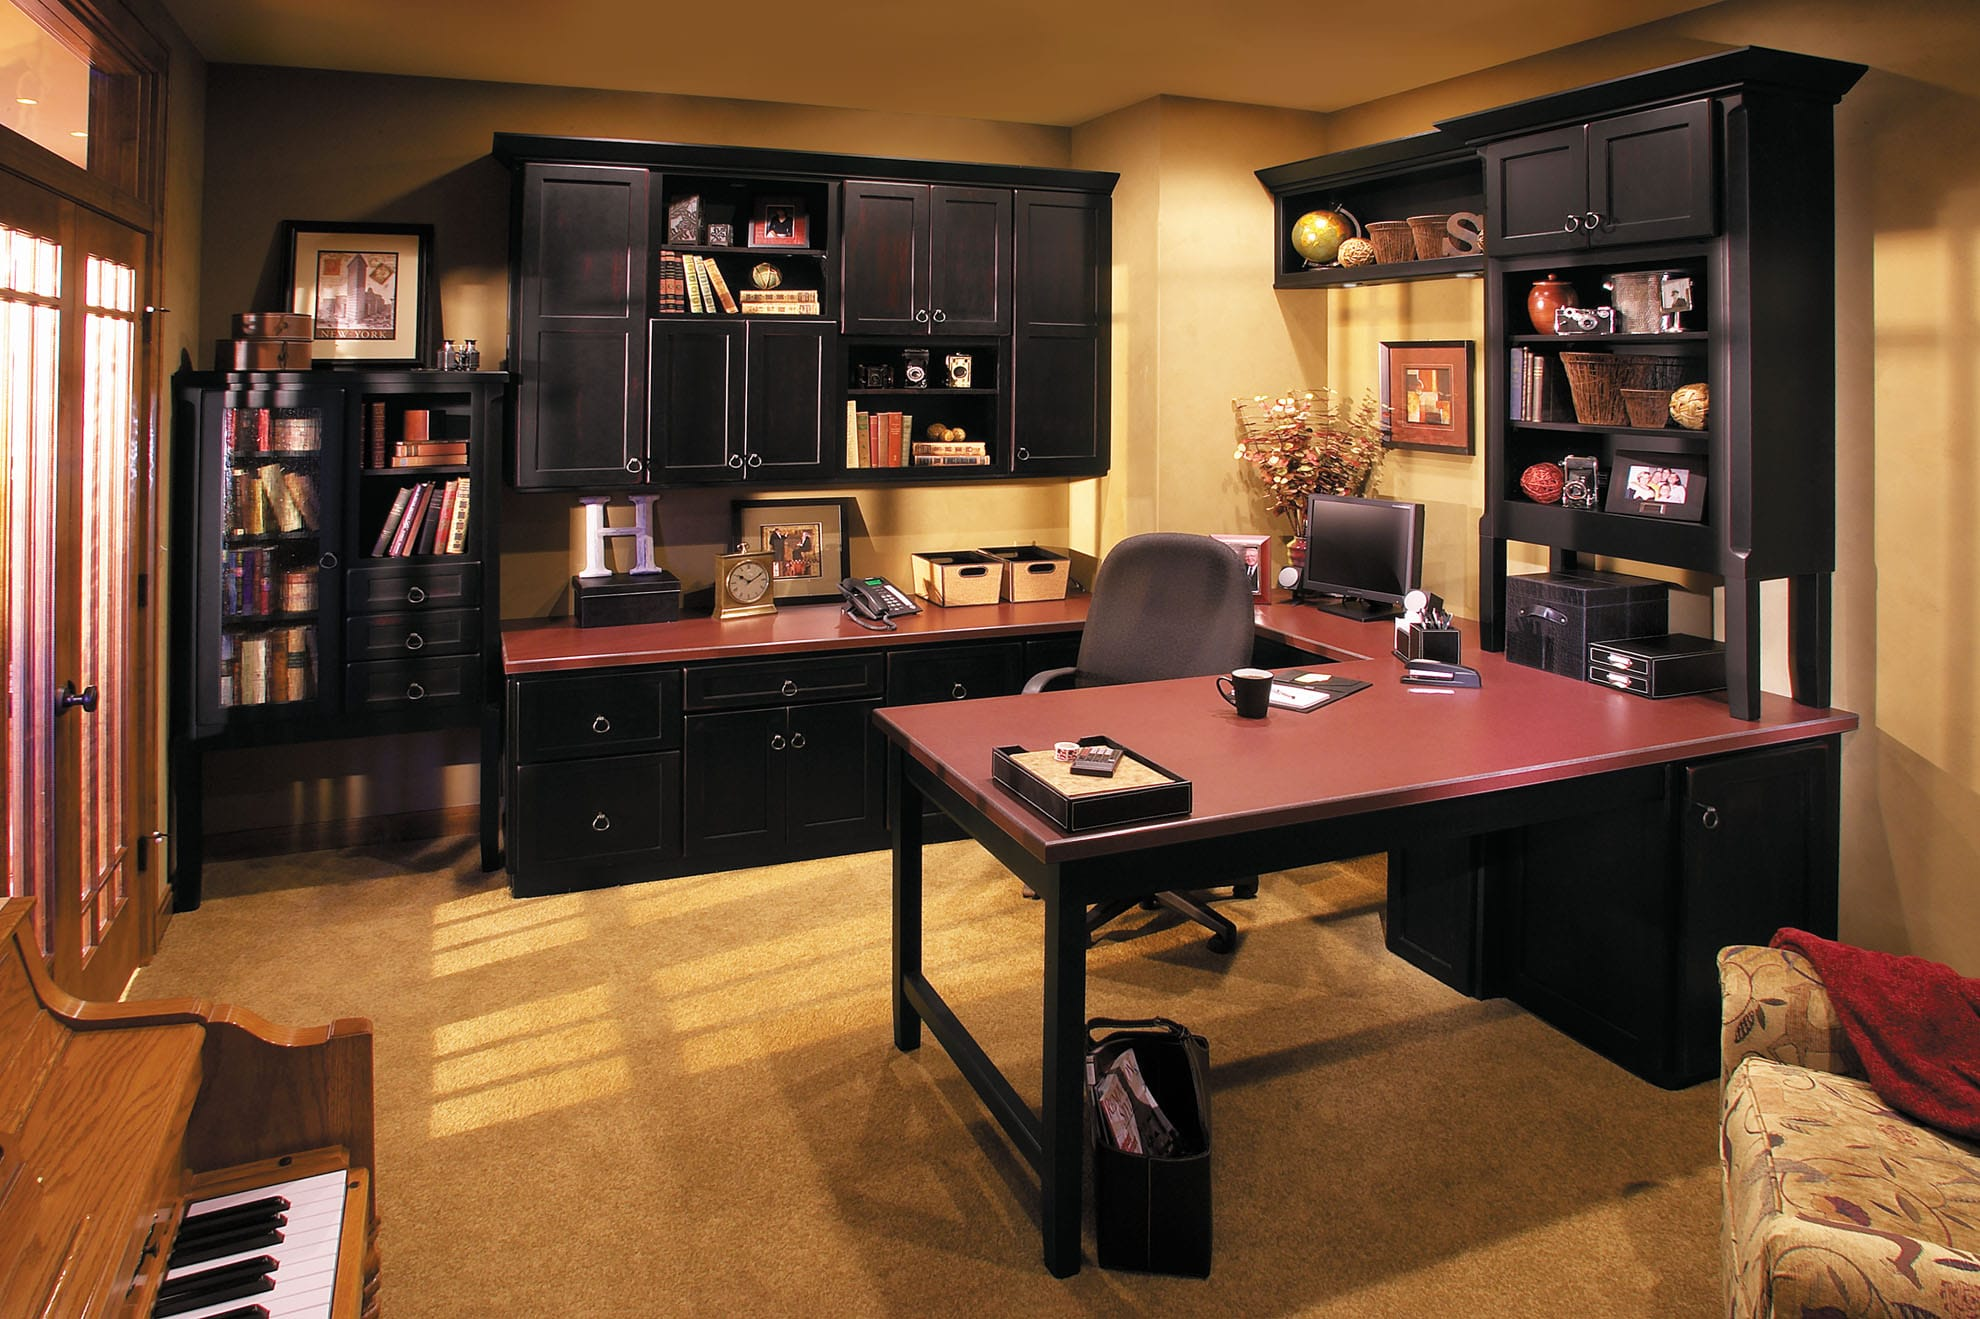 organizing your business office organizing your business organized home desk decor organizing home office amazing office organization ideas office